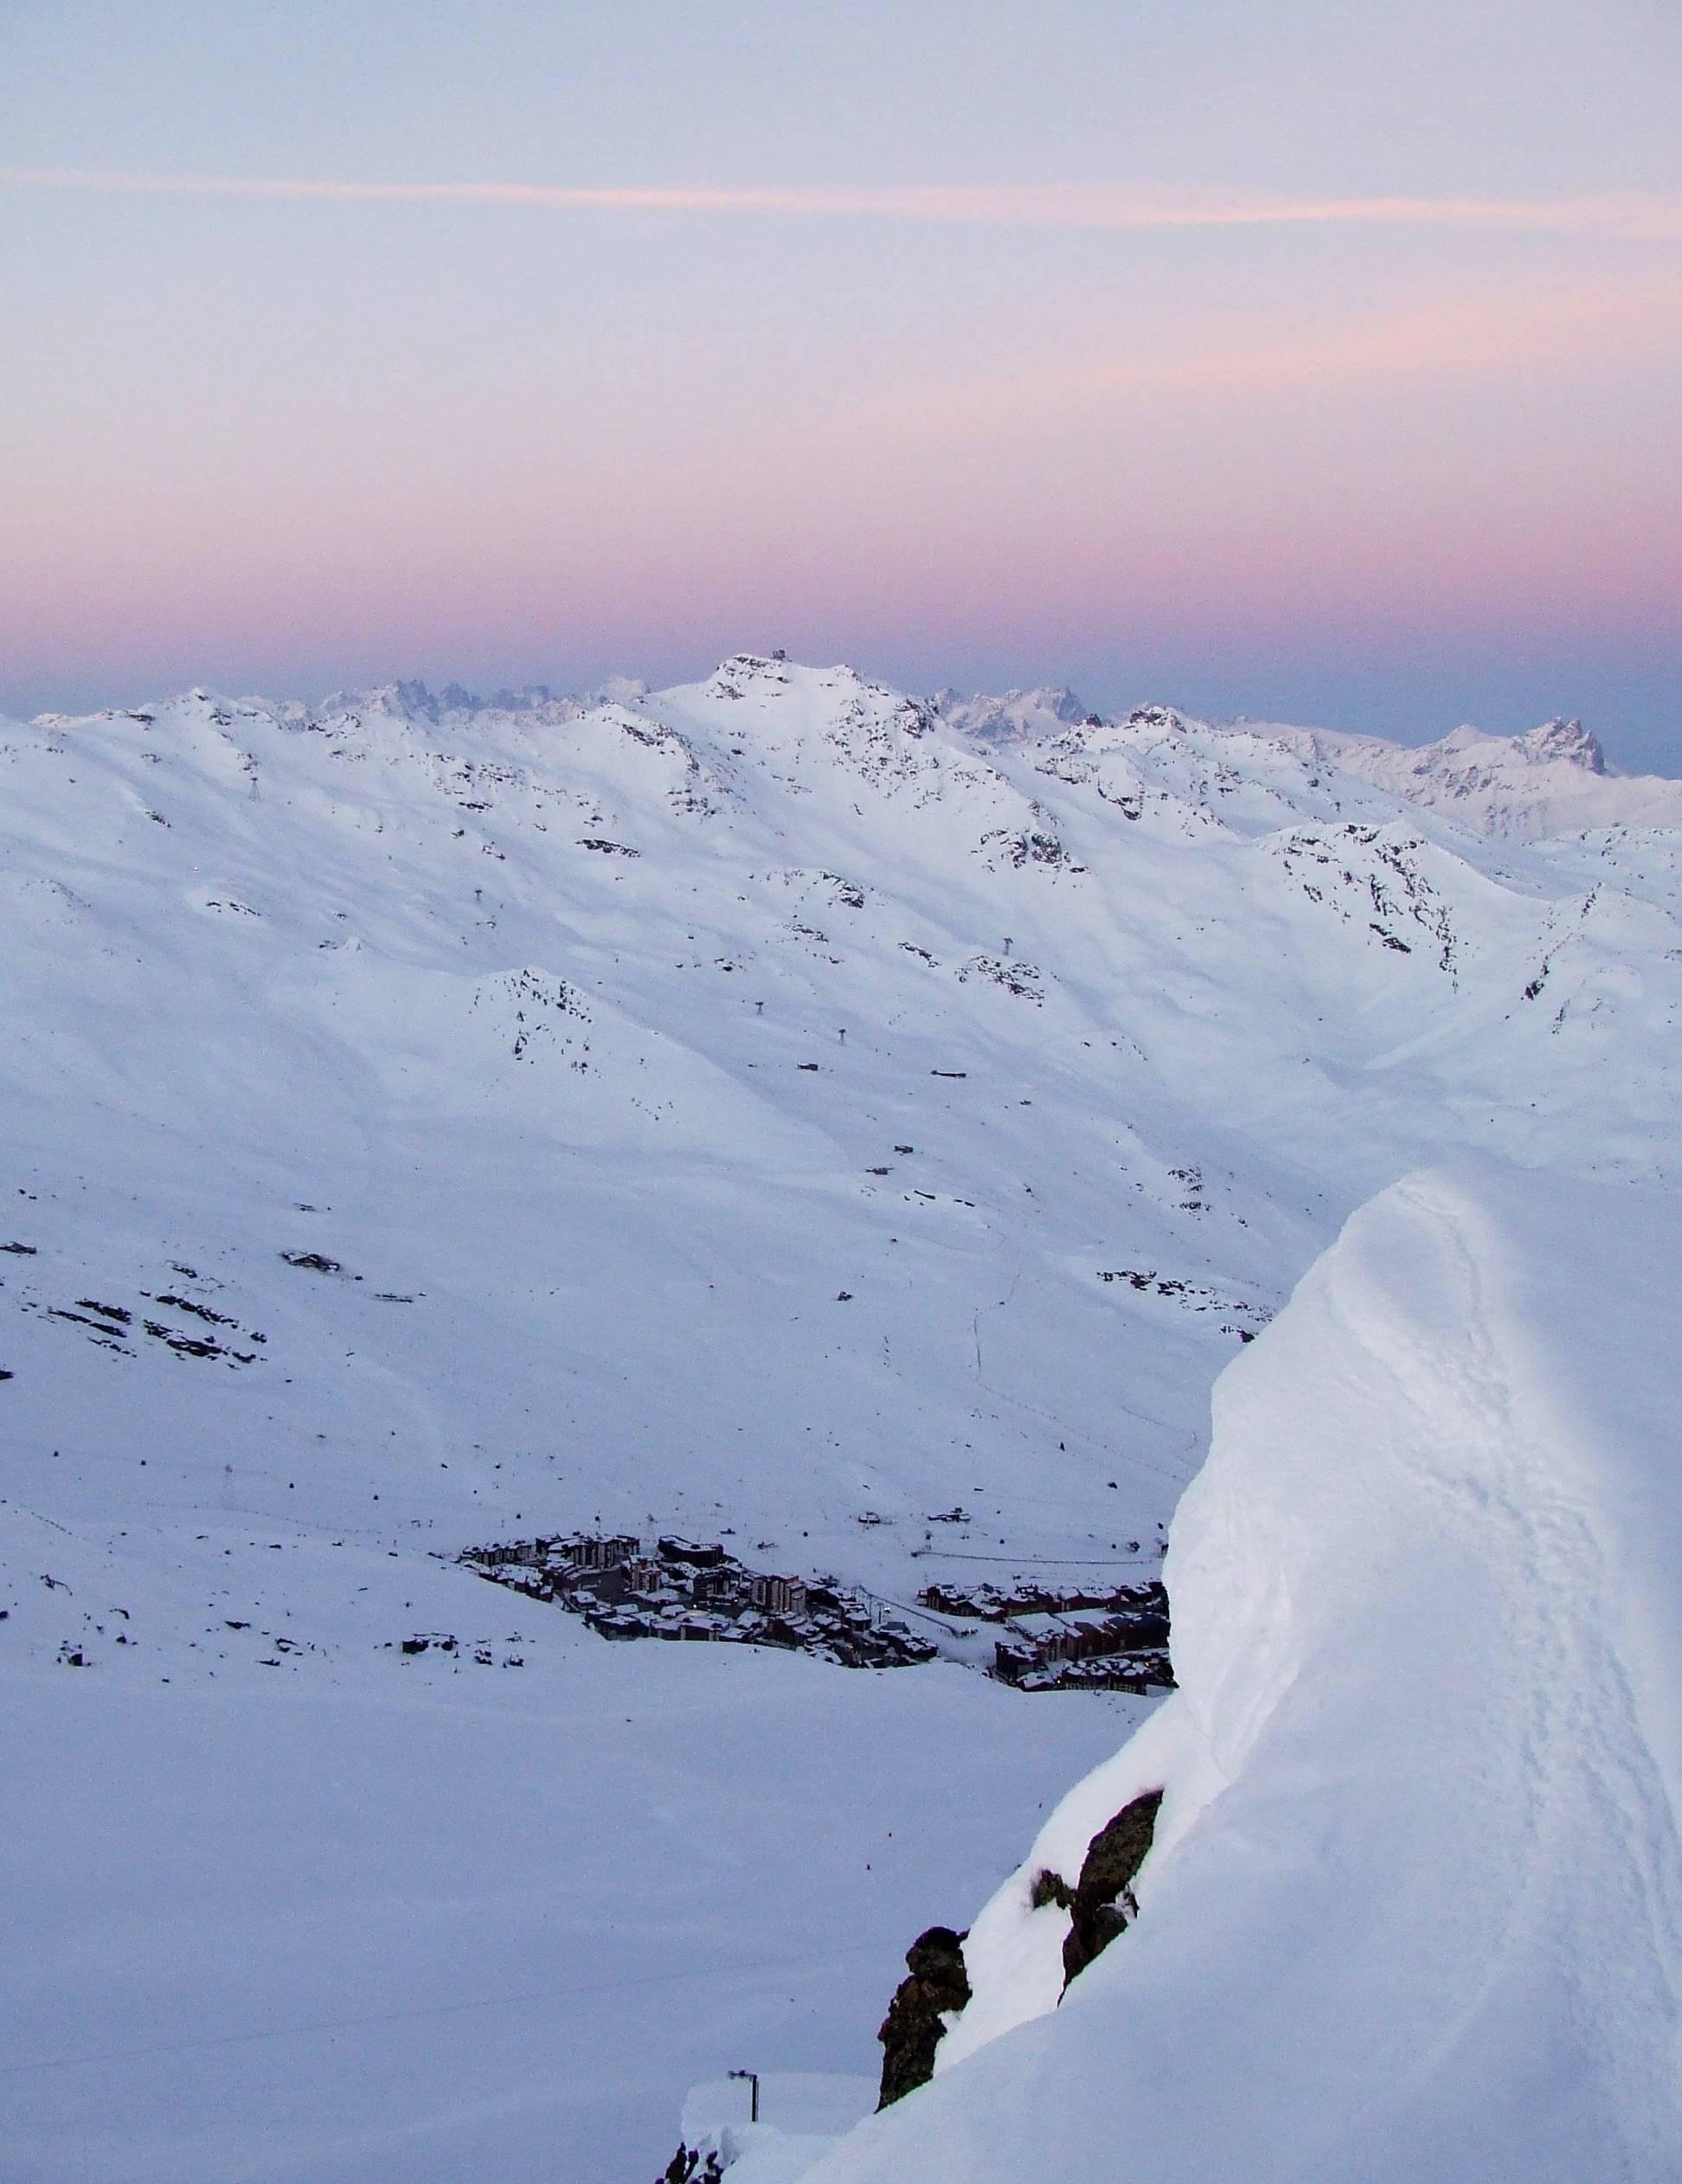 Val Thorens narciarski raj w chmurach